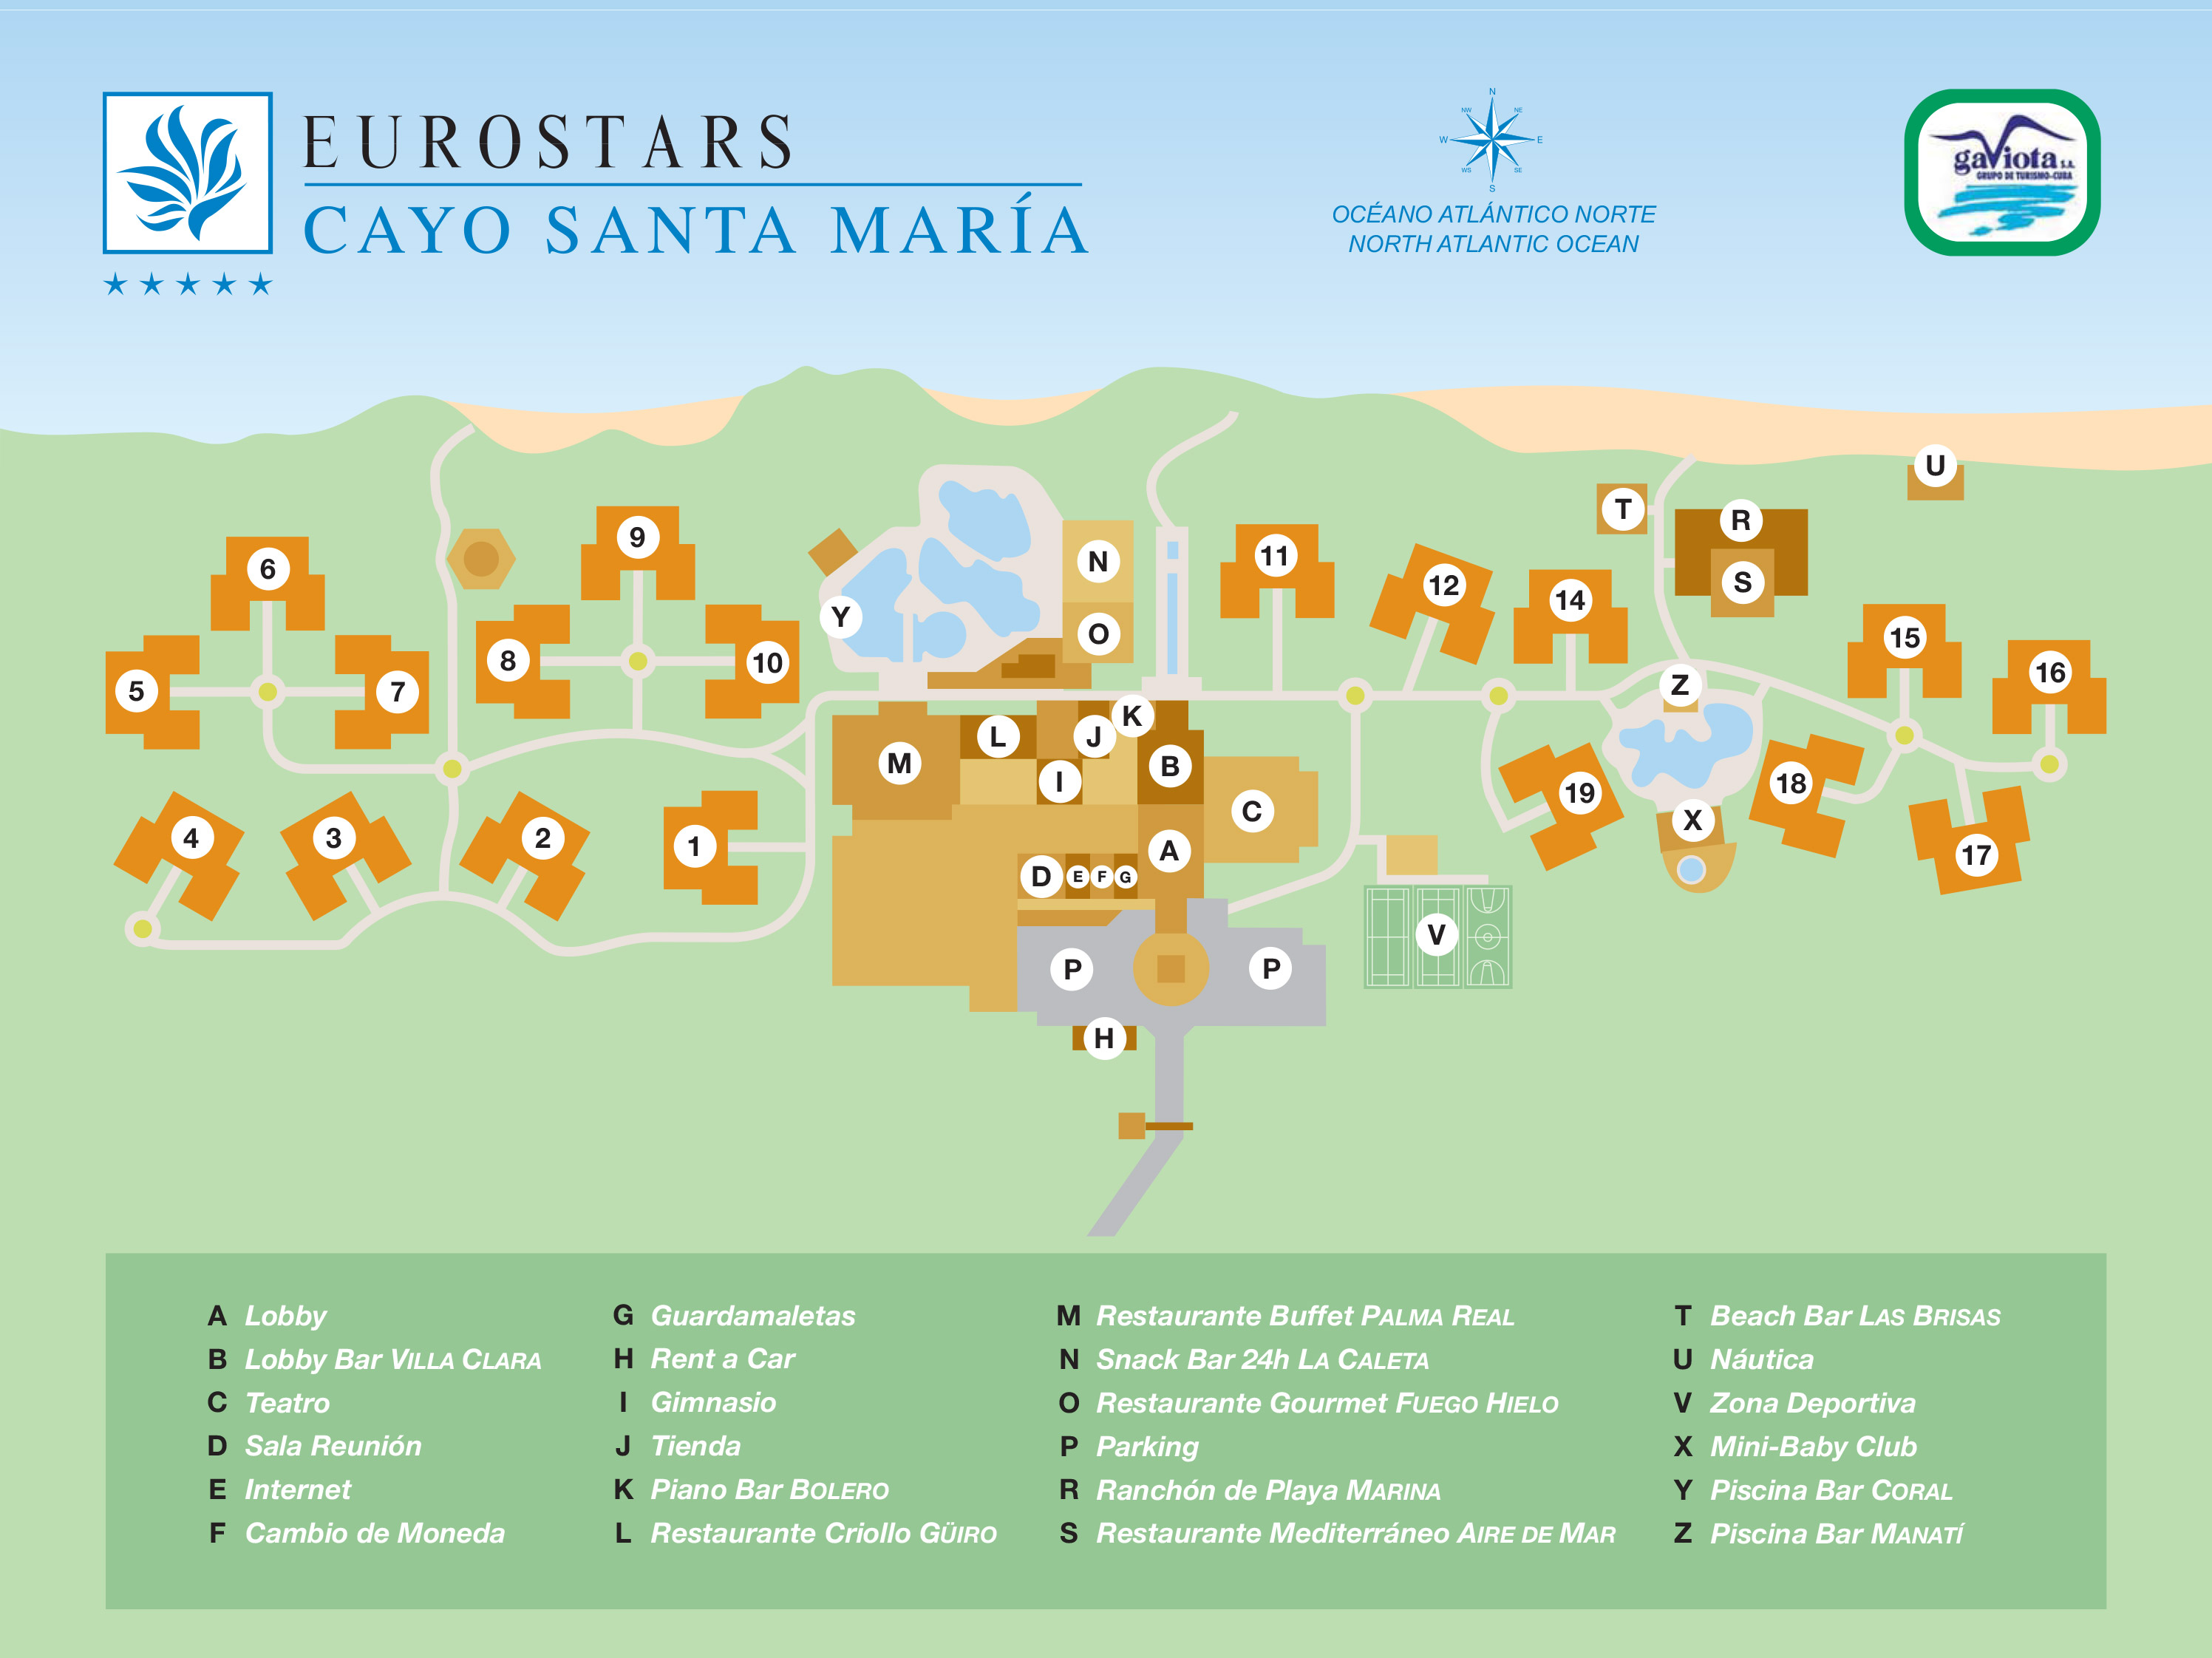 Golden Tulip Aguas Claras Resort   Santa Clara (Cayo Santa Maria